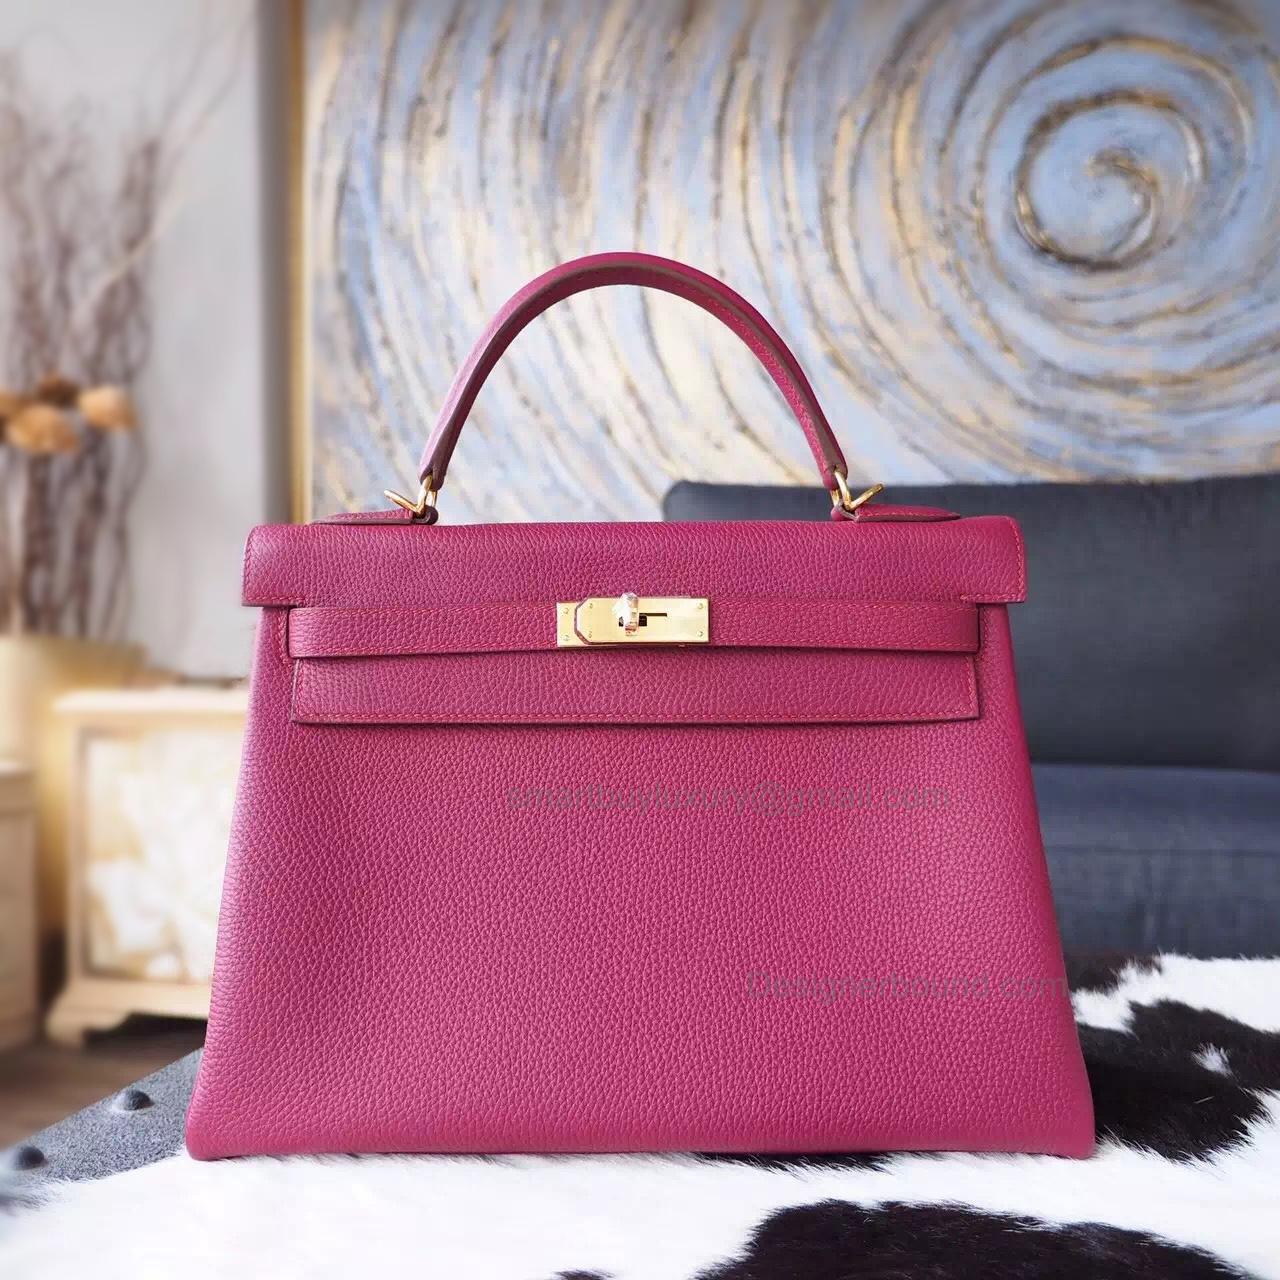 bcfacf31e24 Replica Hermes Kelly 28 Handmade Bag in k5 Tosca Togo Calfskin GHW -